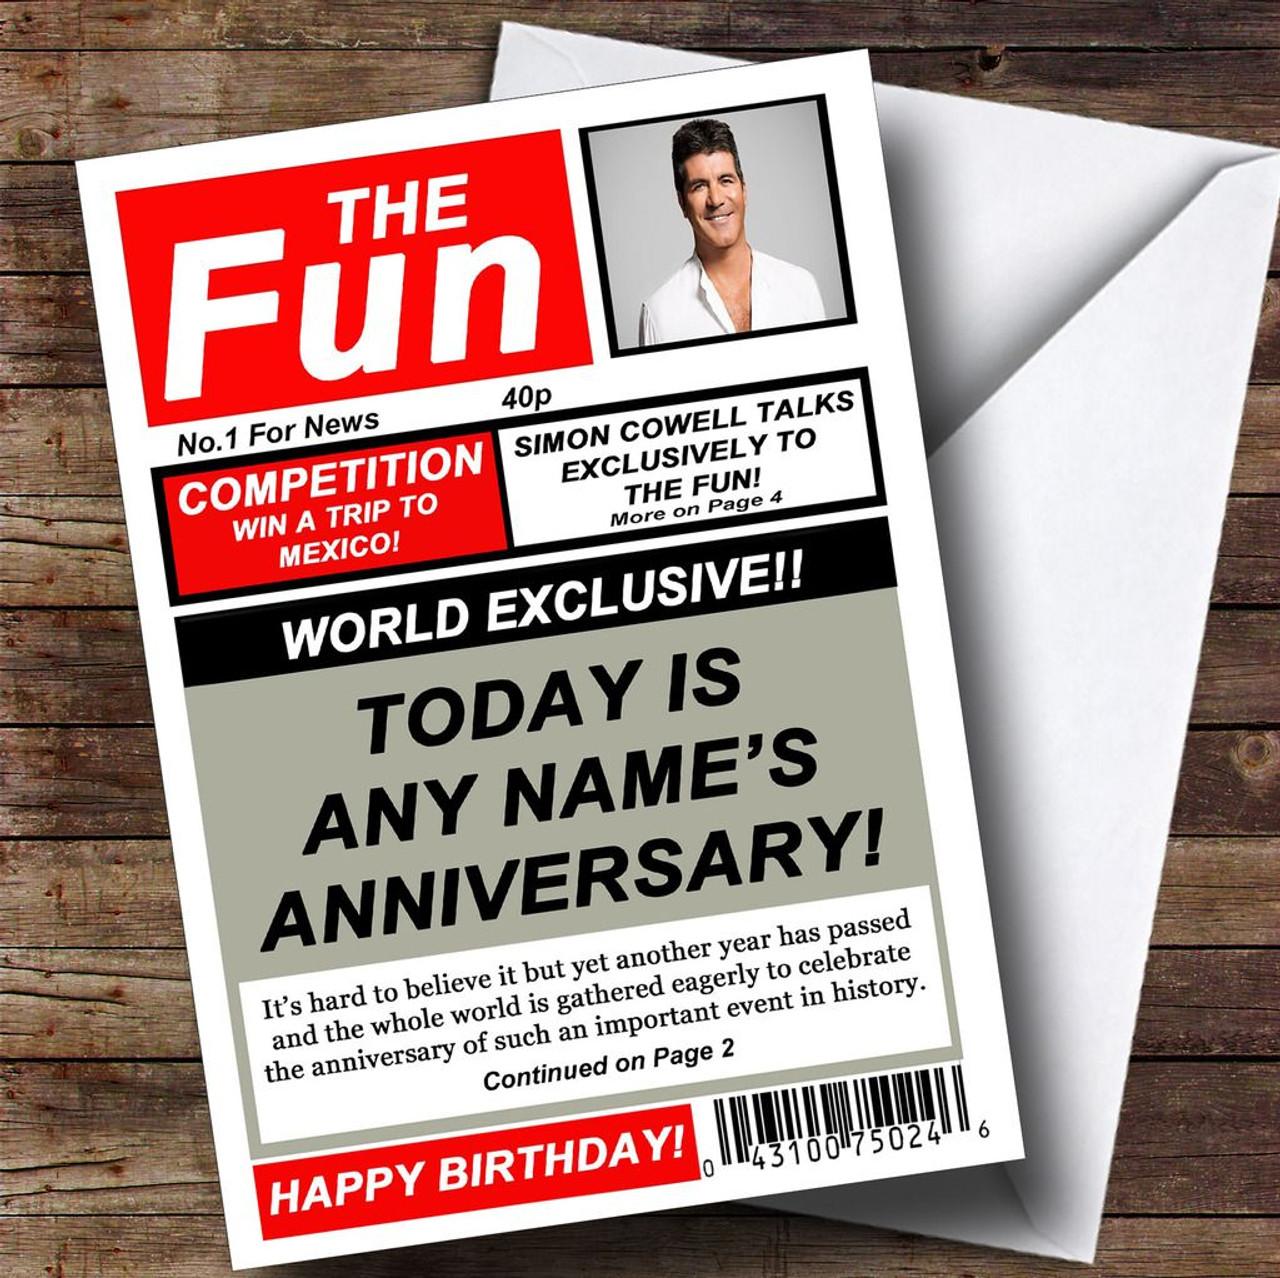 tesco value wedding invitations - 28 images - birthday invitations ...